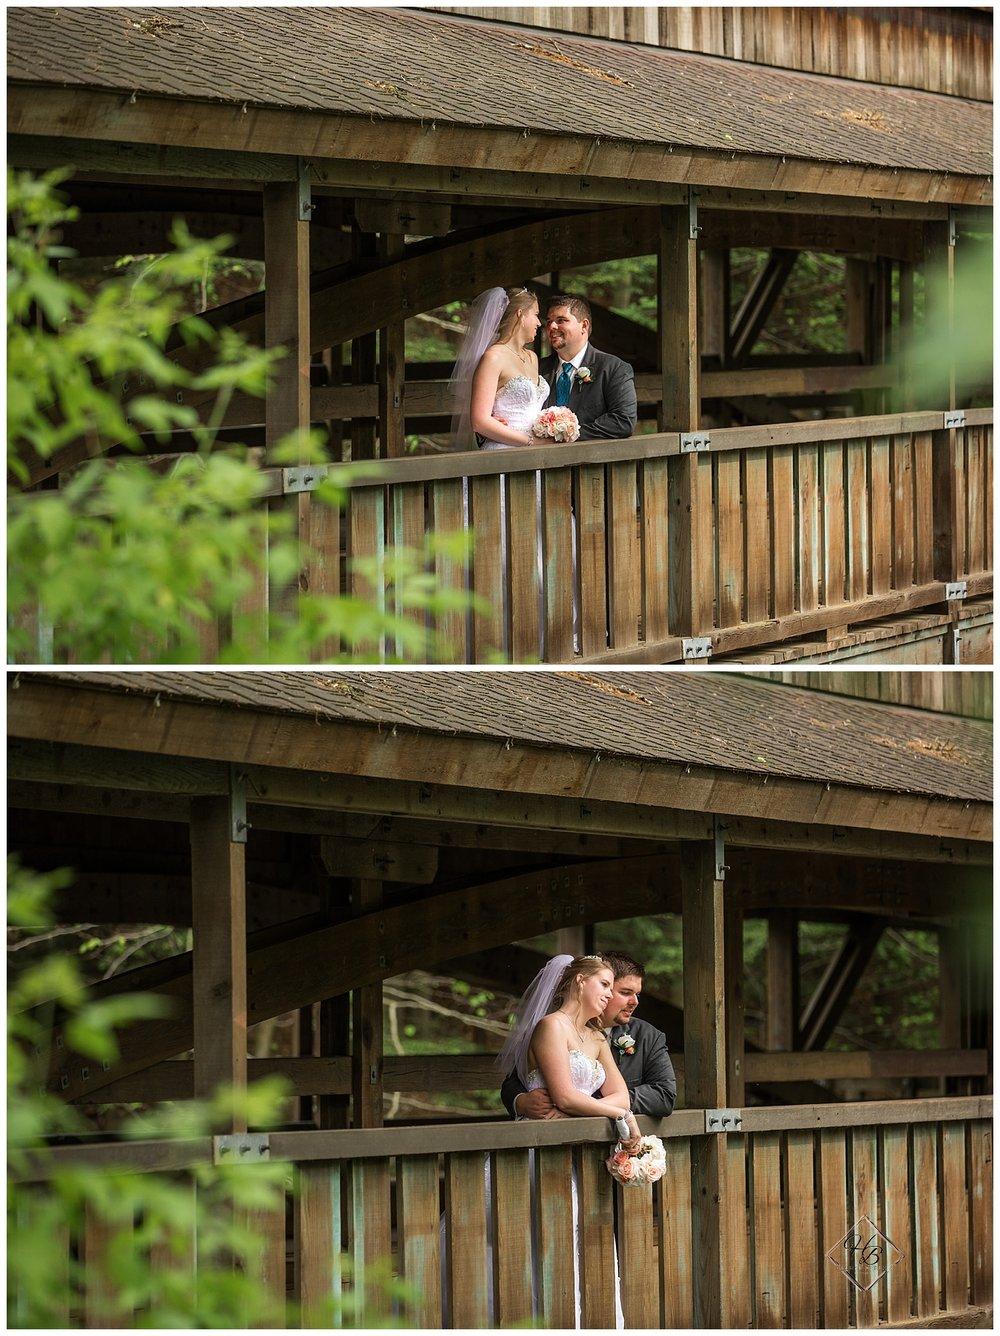 Youngstown, OH Fairytale Wedding Fellows Lanterman's Mill Bride Groom Photos